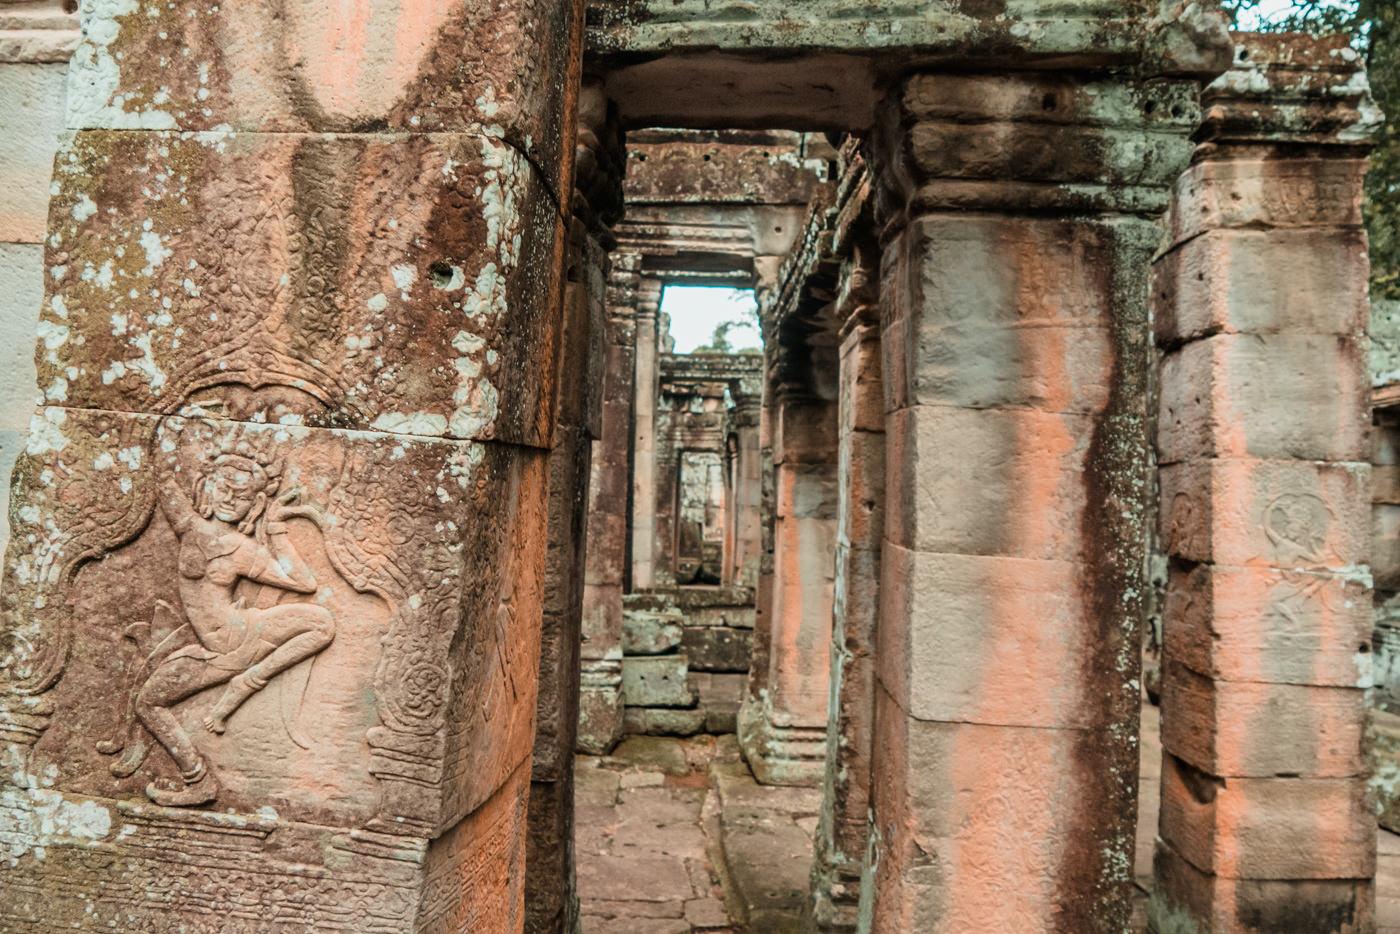 Säulen im Tempel Banteay Kdei, Angkor Wat, Kambodscha